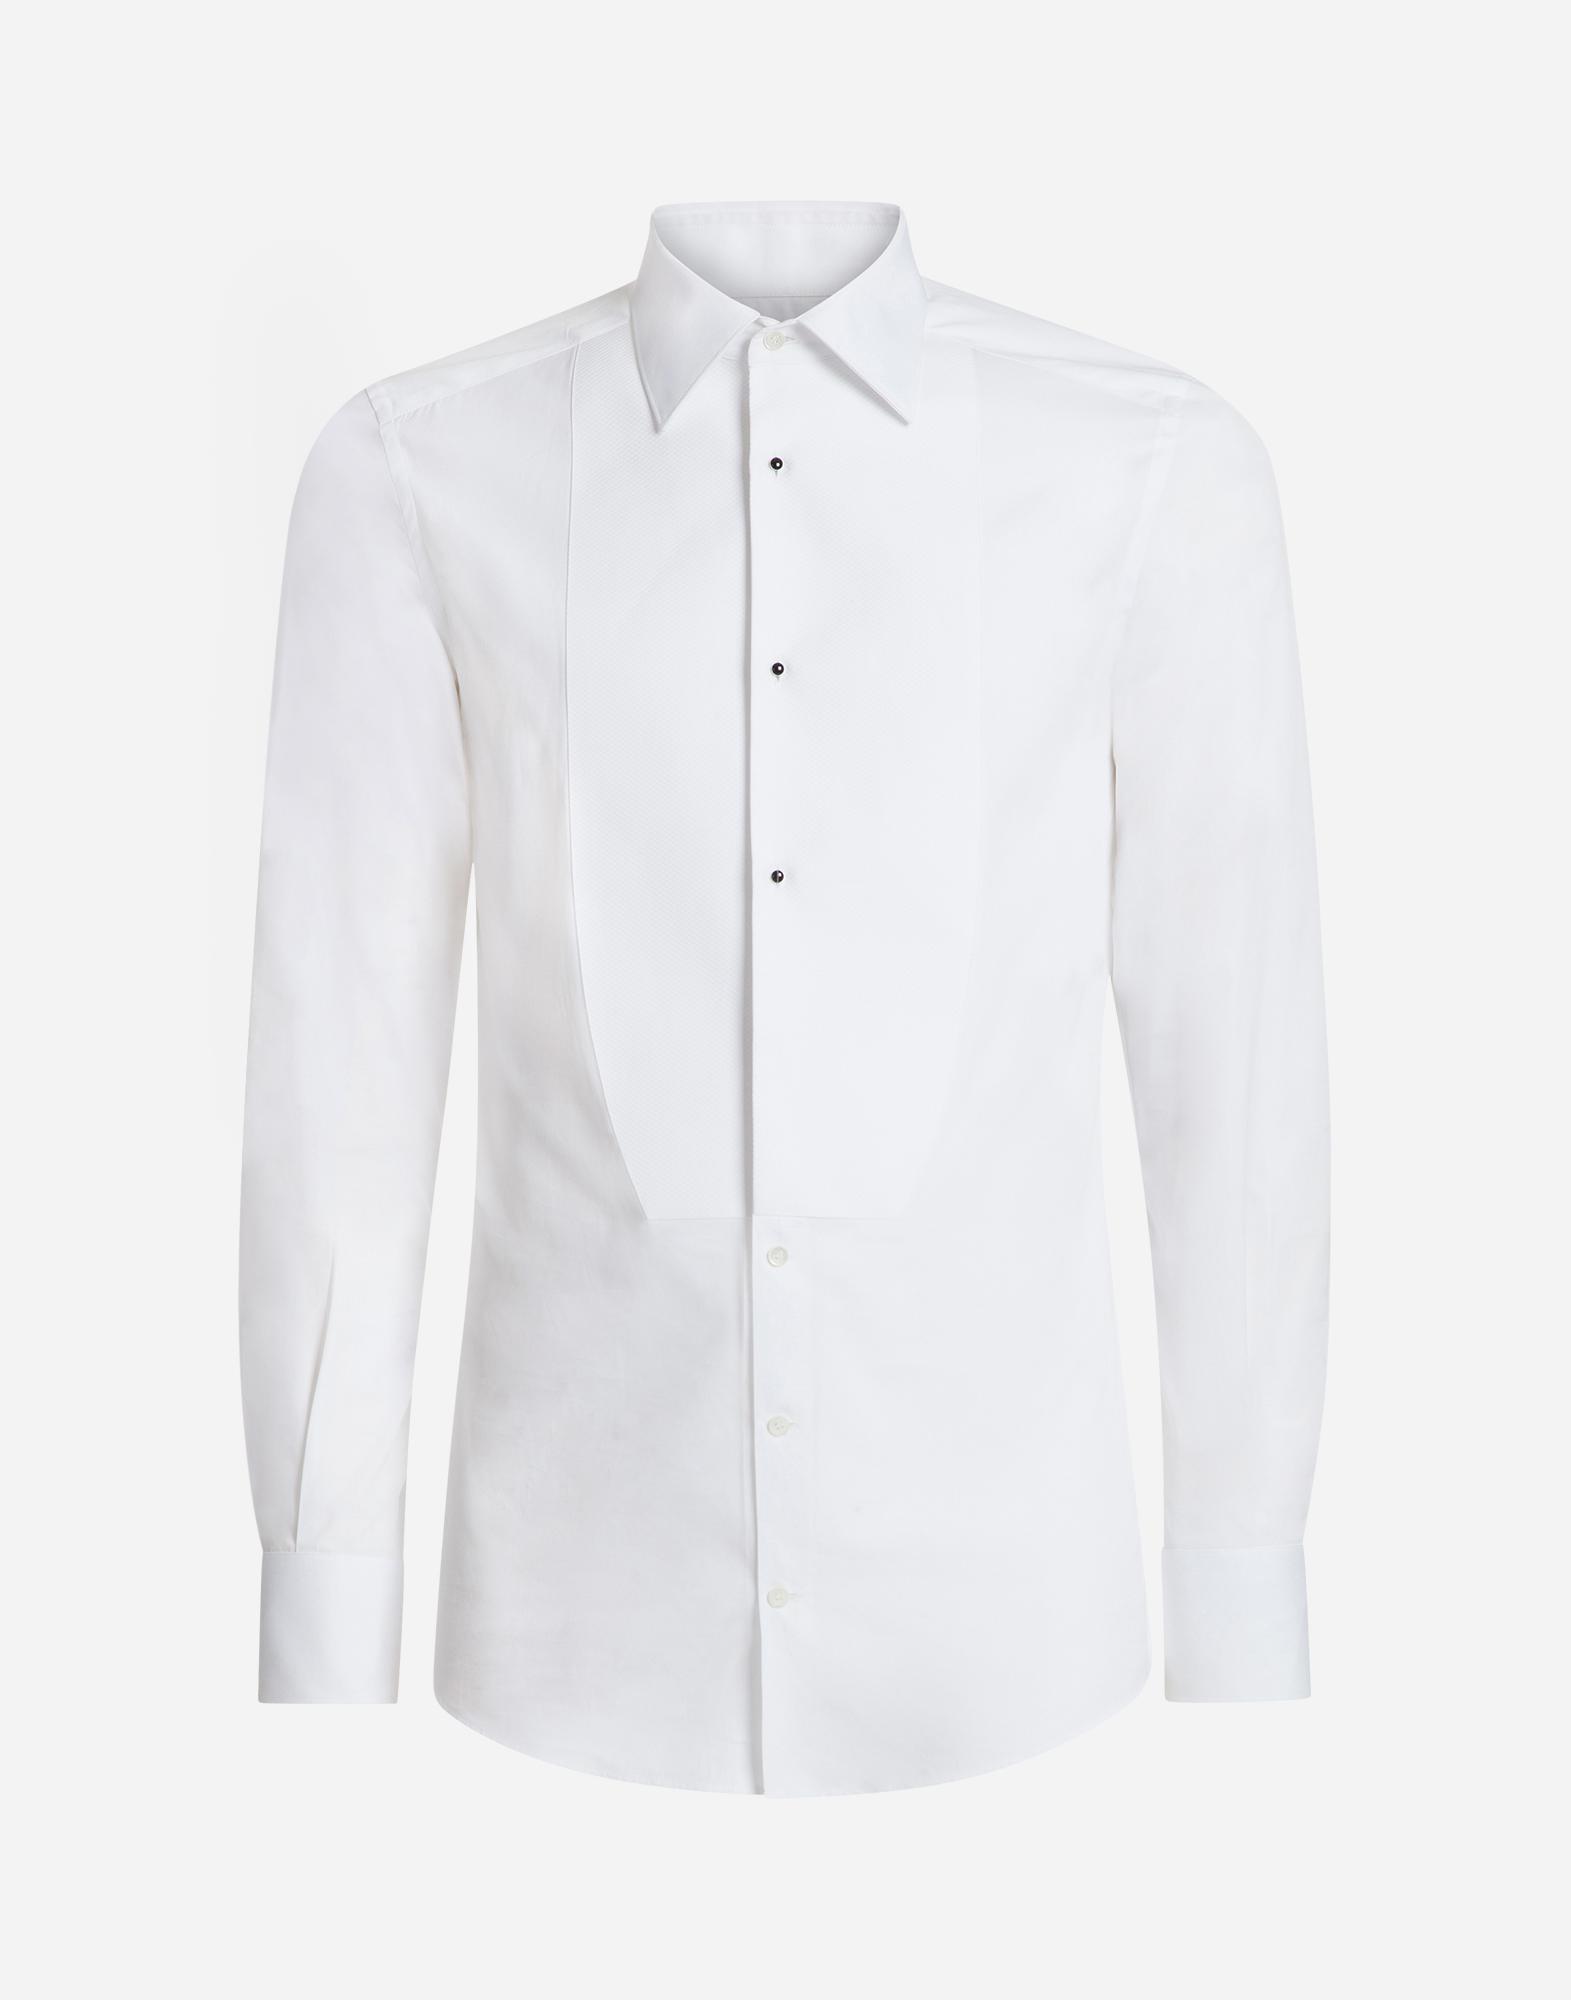 Men's shirts | Dolce&Gabbana - GOLD FIT TUXEDO SHIRT IN COTTON POPLIN